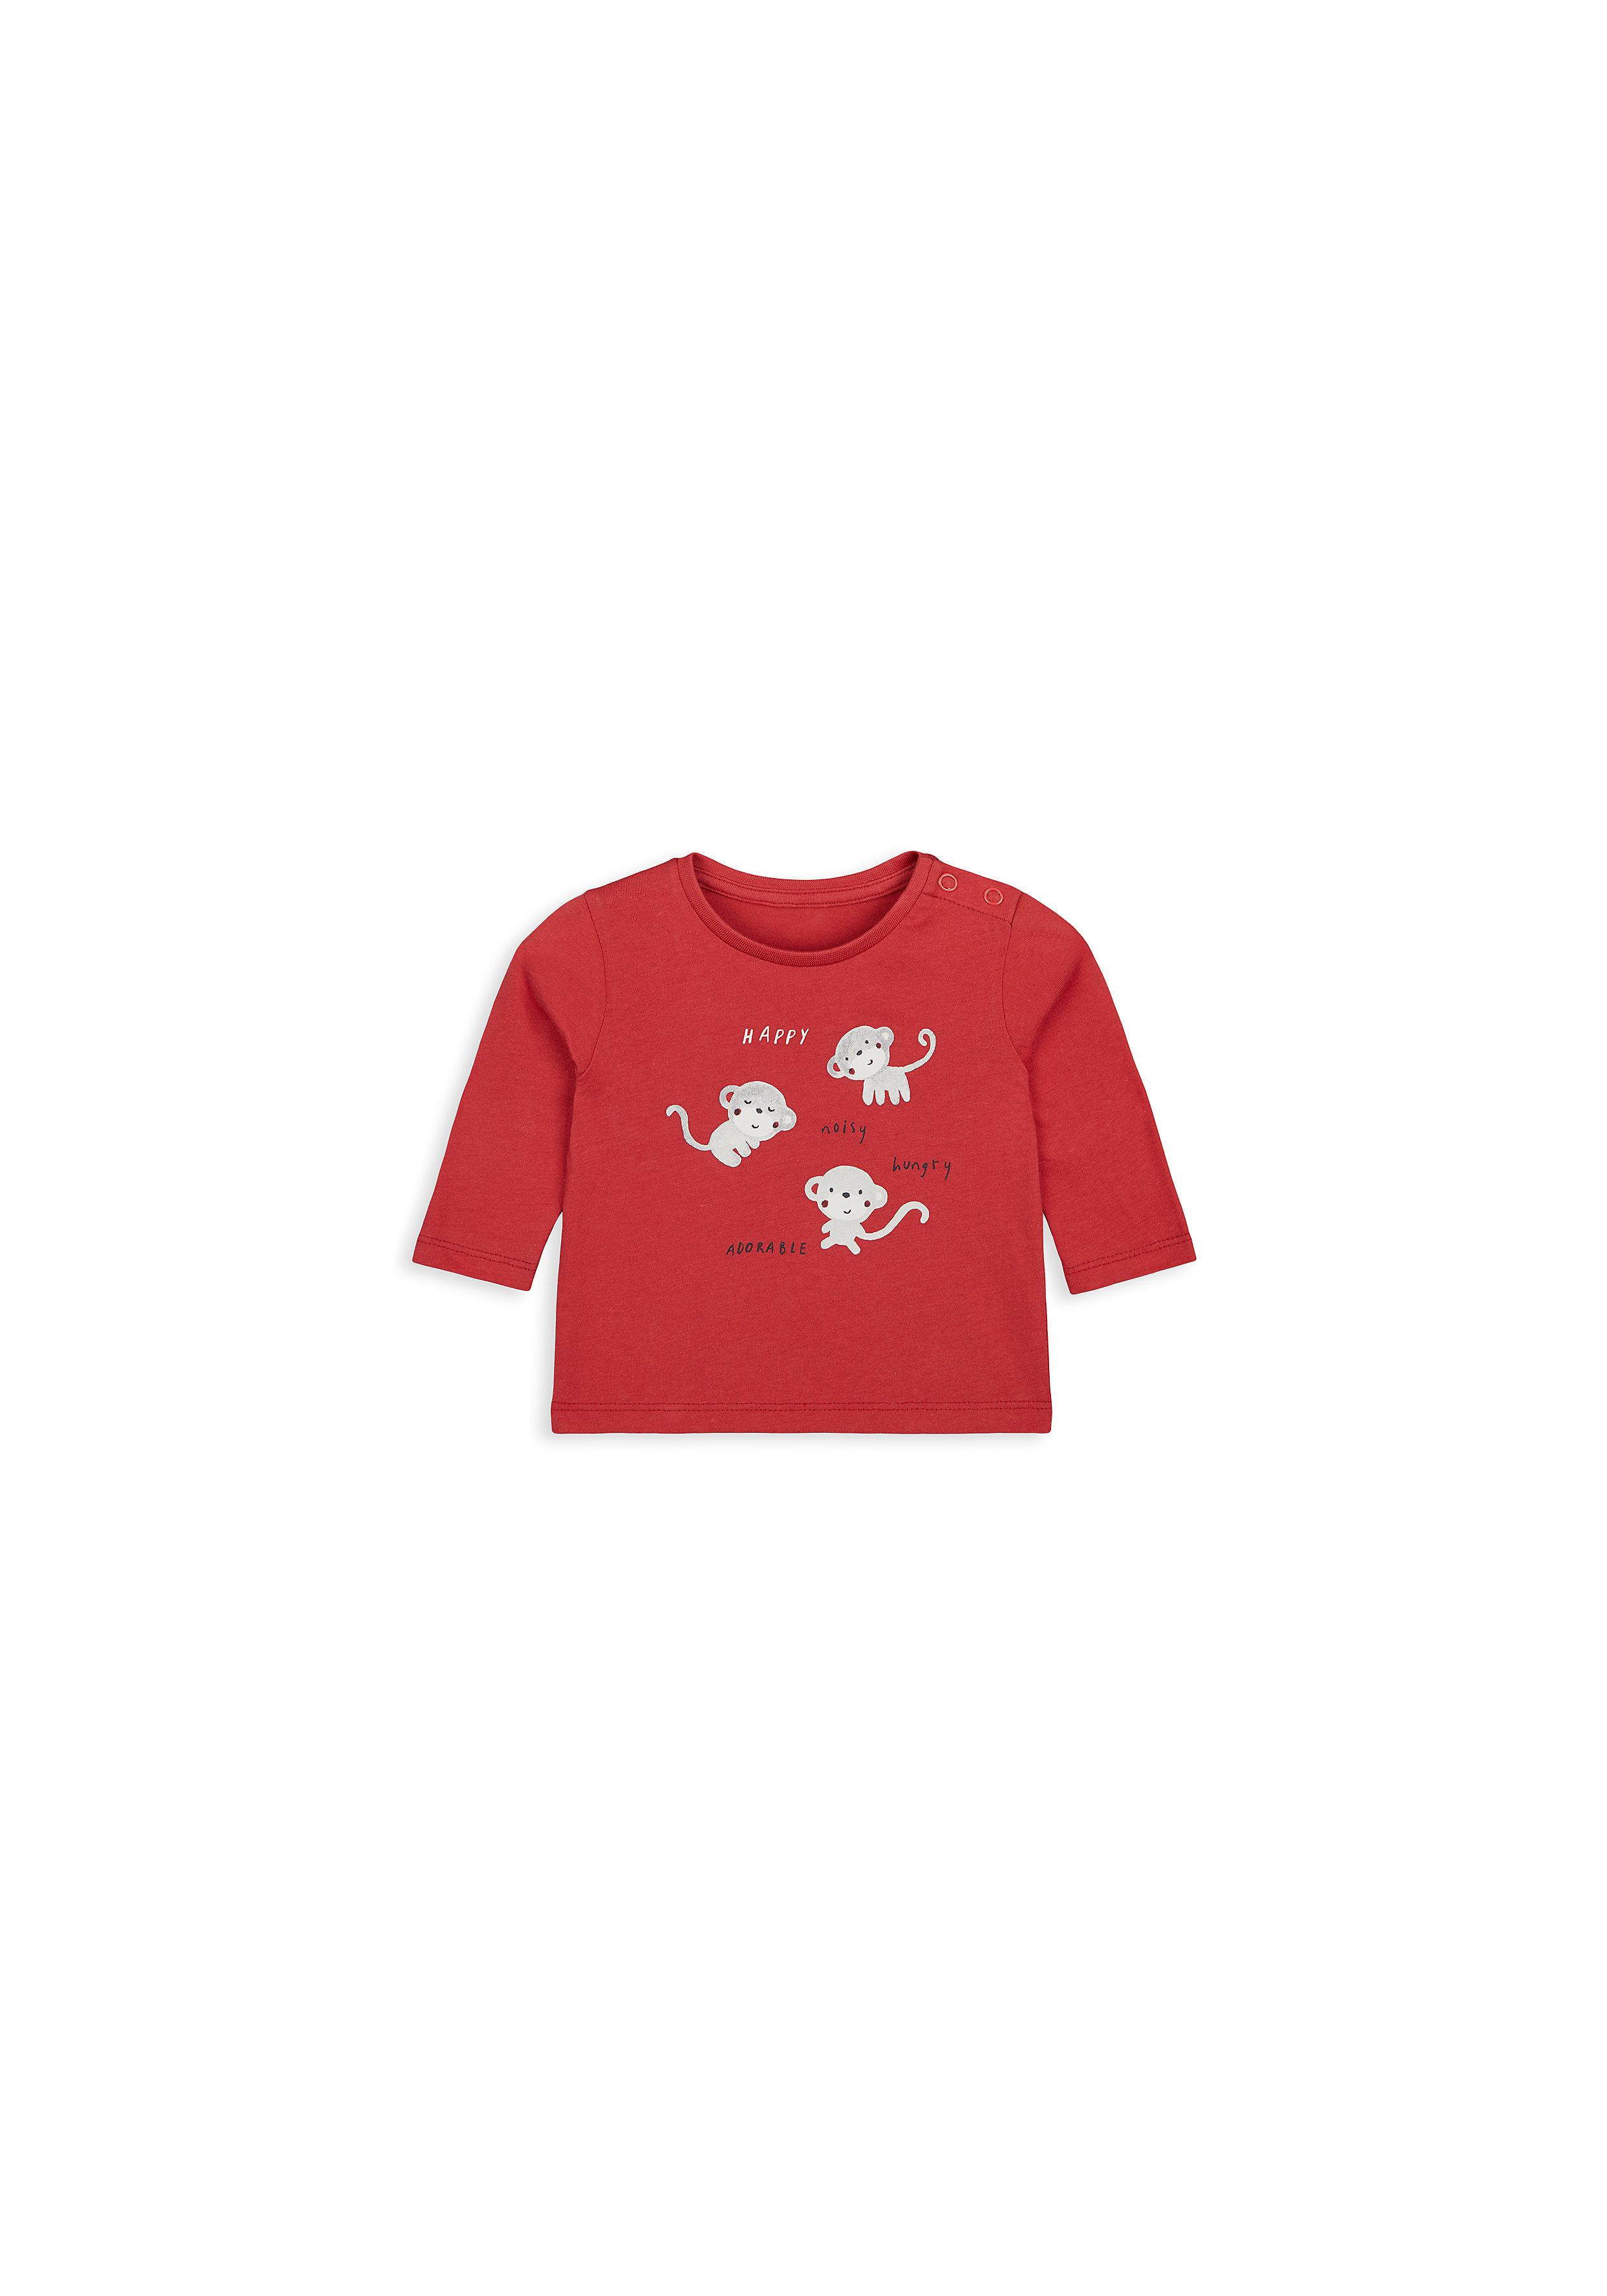 Mothercare   Boys Full Sleeves T-Shirt Monkey Print - Red